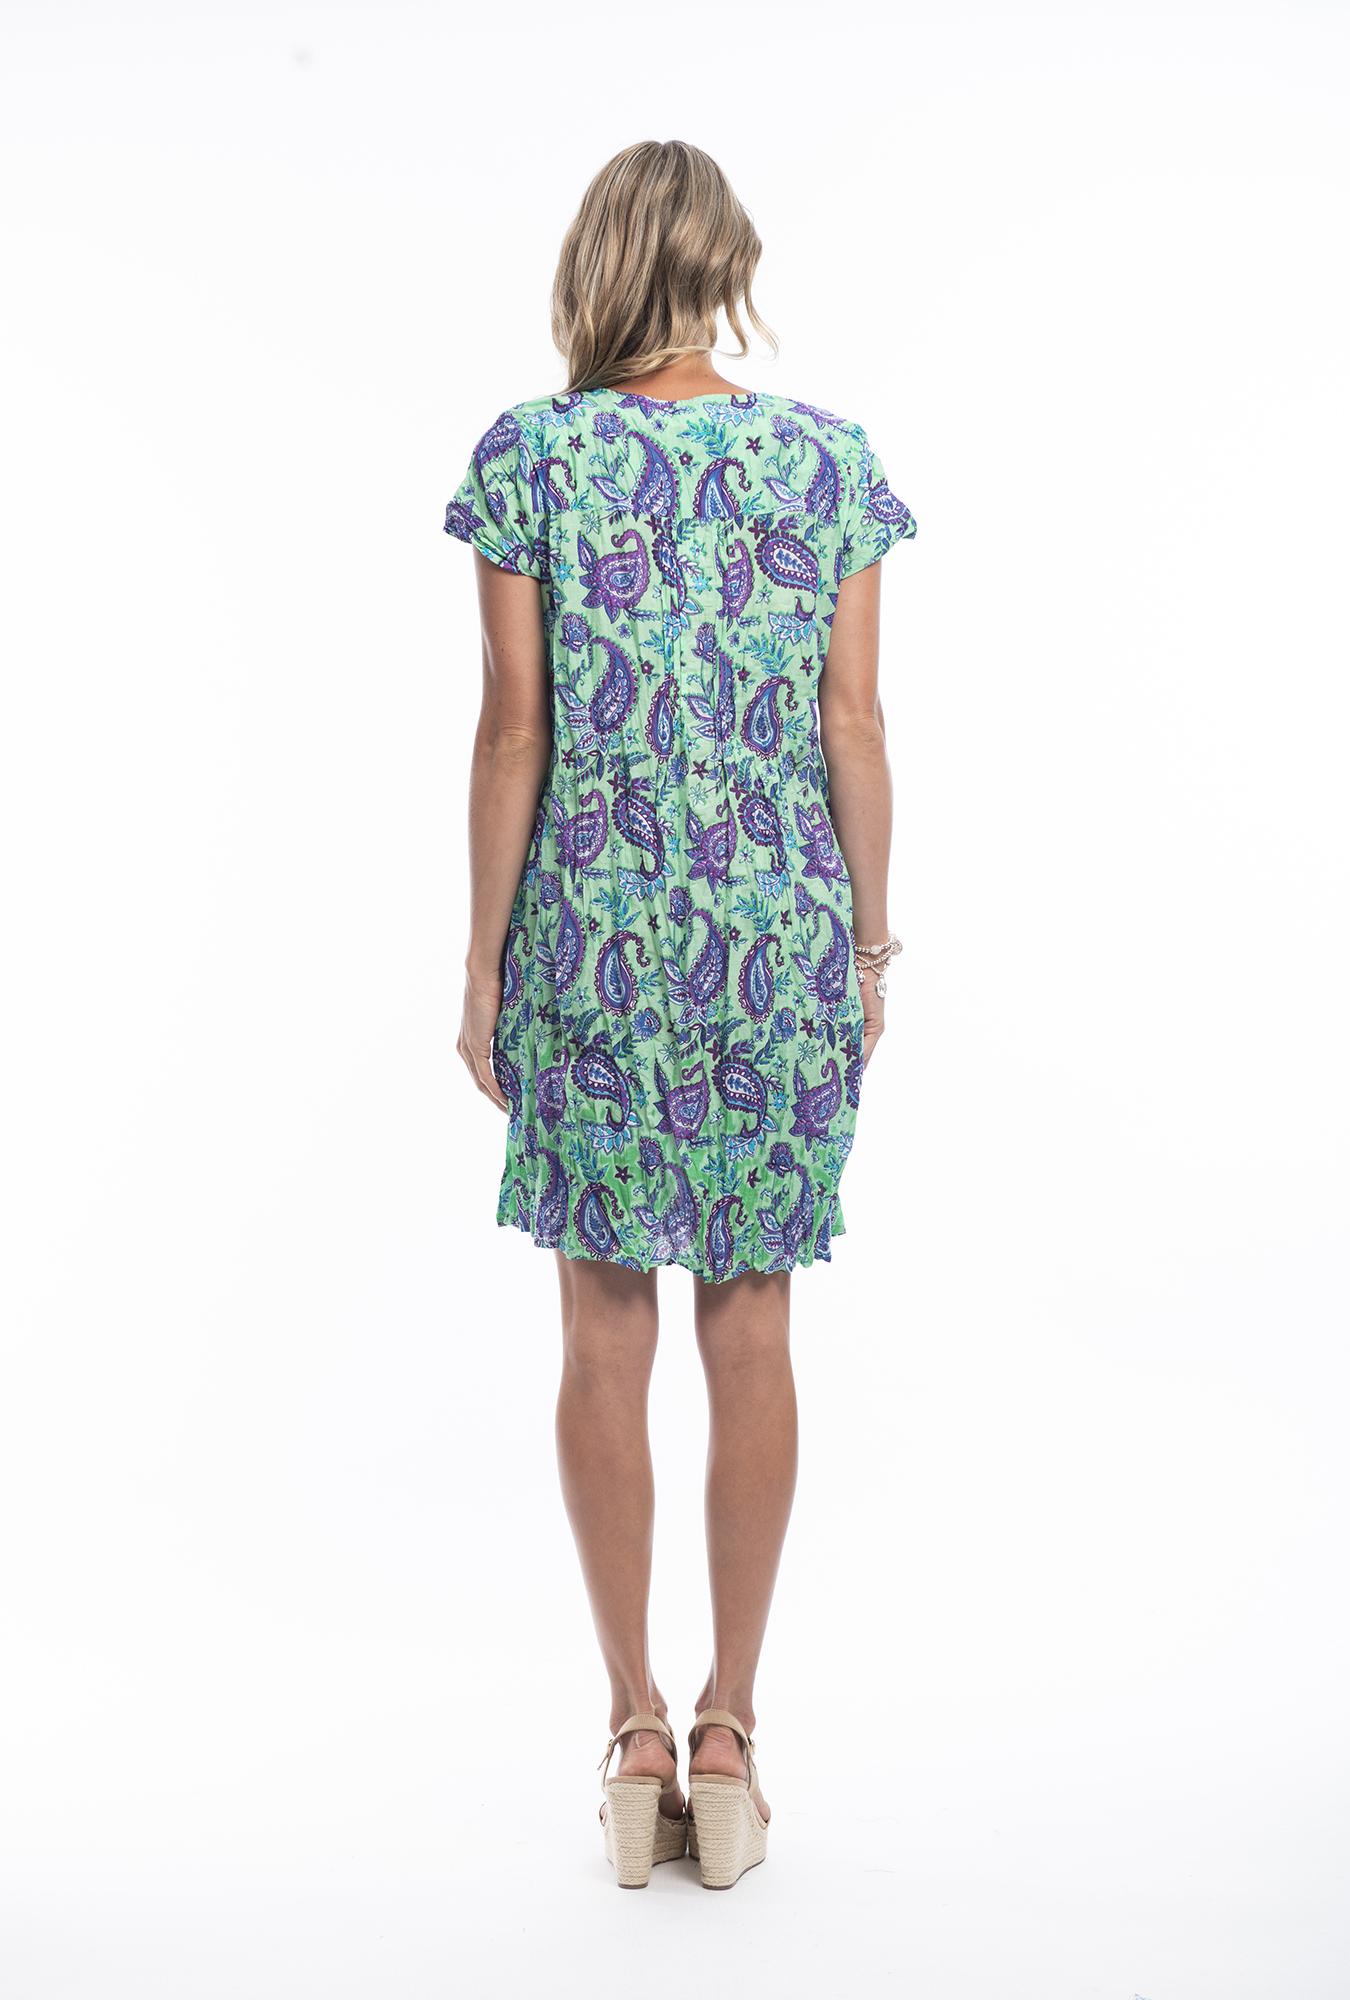 Marla Dress in Green Paisley